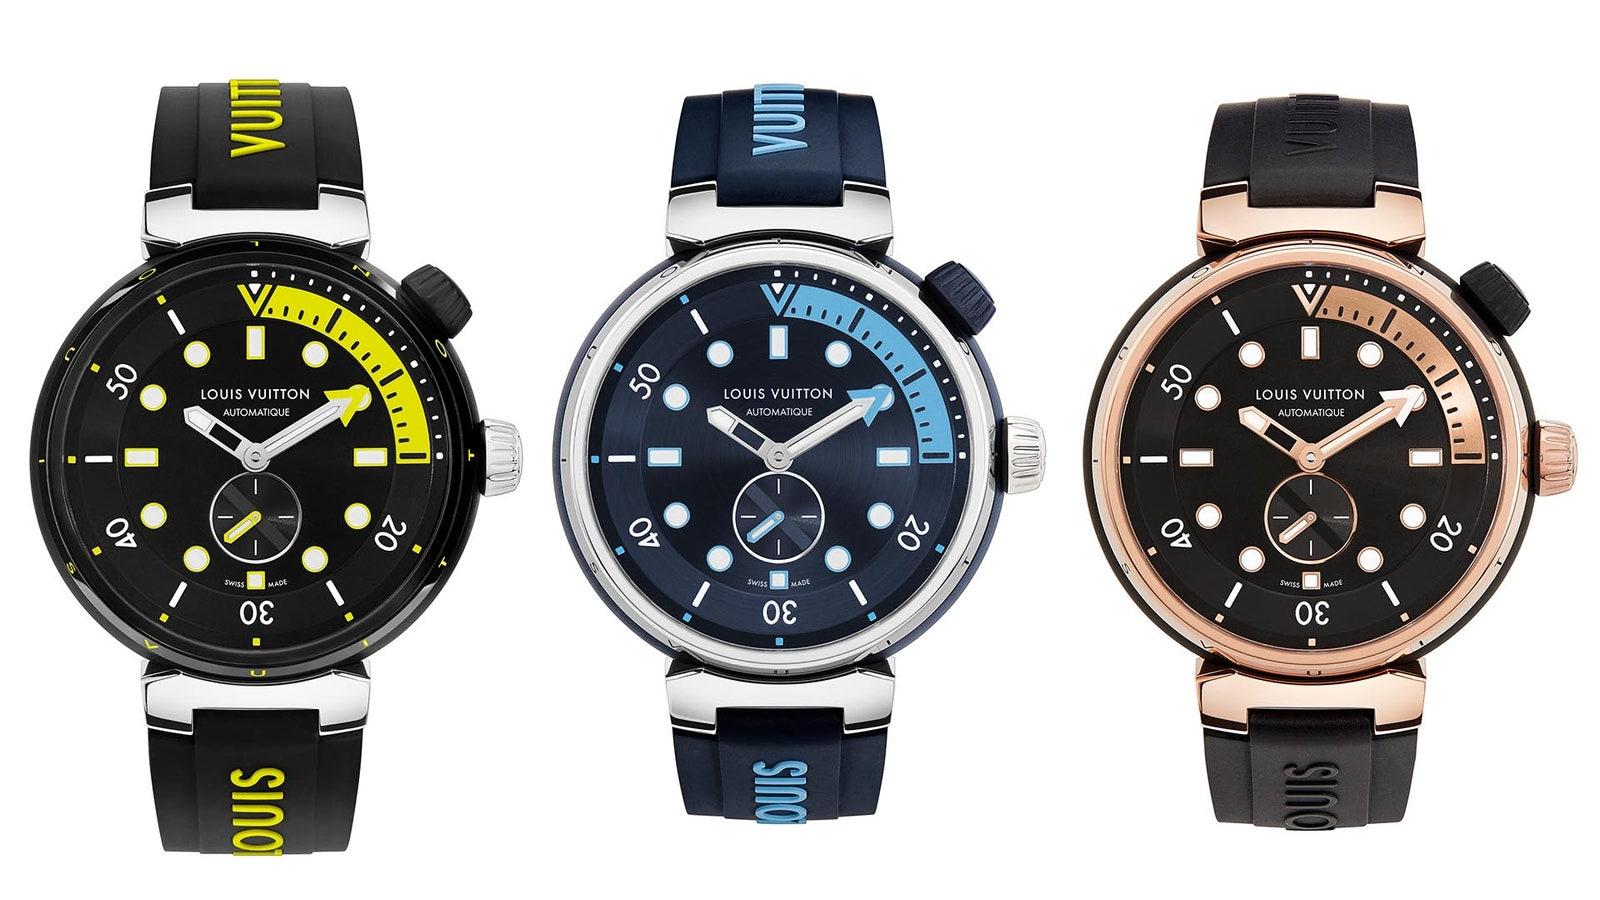 Đồng hồ Louis Vuitton Tambour Street Diver trong ba phối màu mới